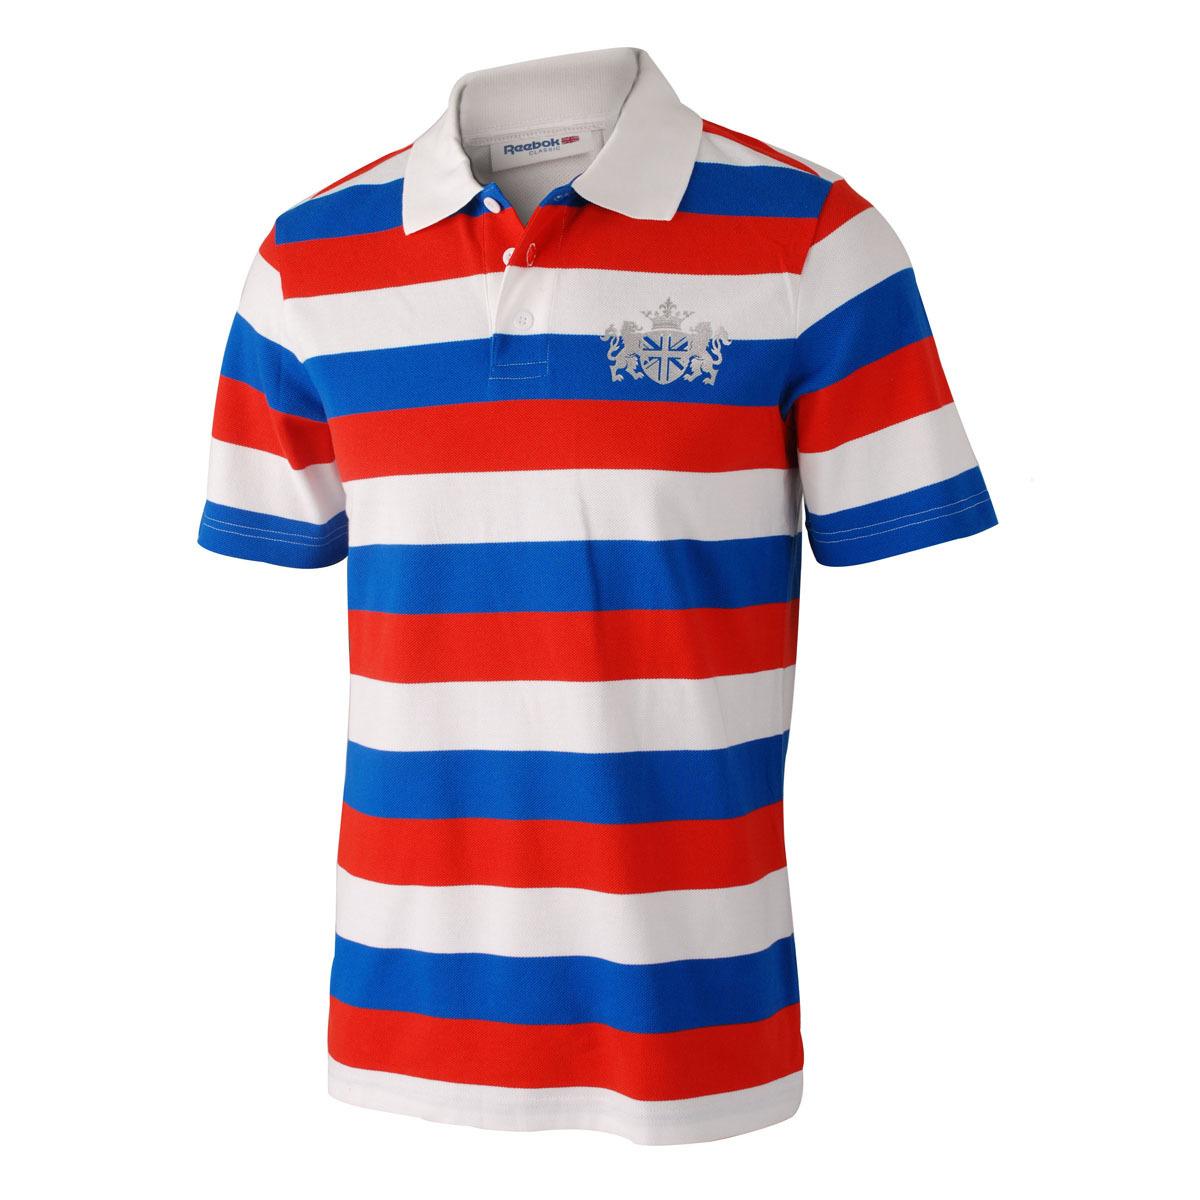 Спортивная футболка Reebok rb5104 Polo I17342 4.5